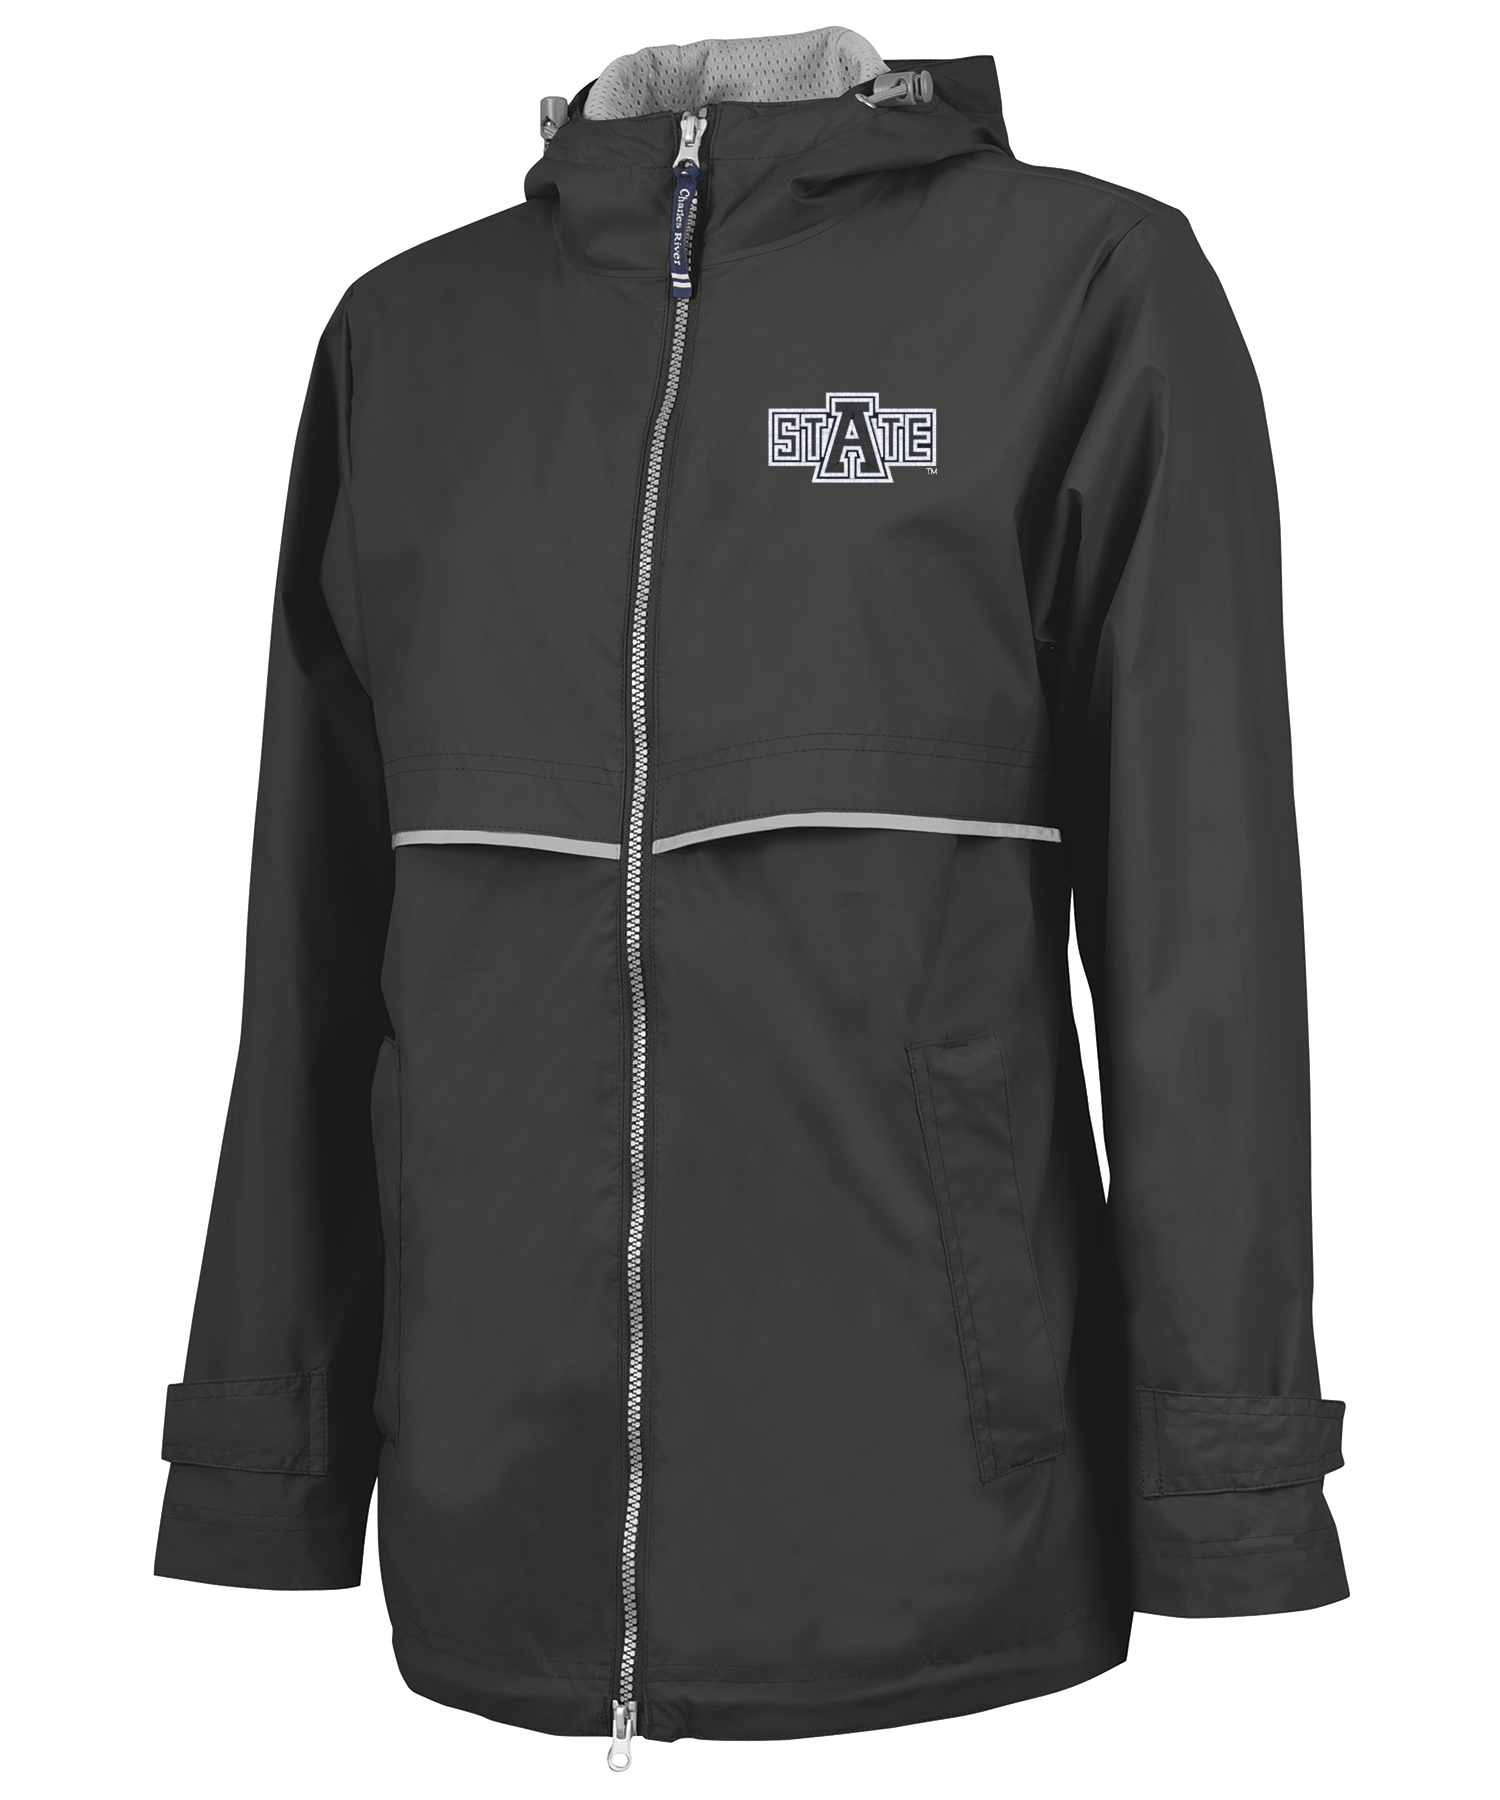 stAte New Englander Rain Jacket